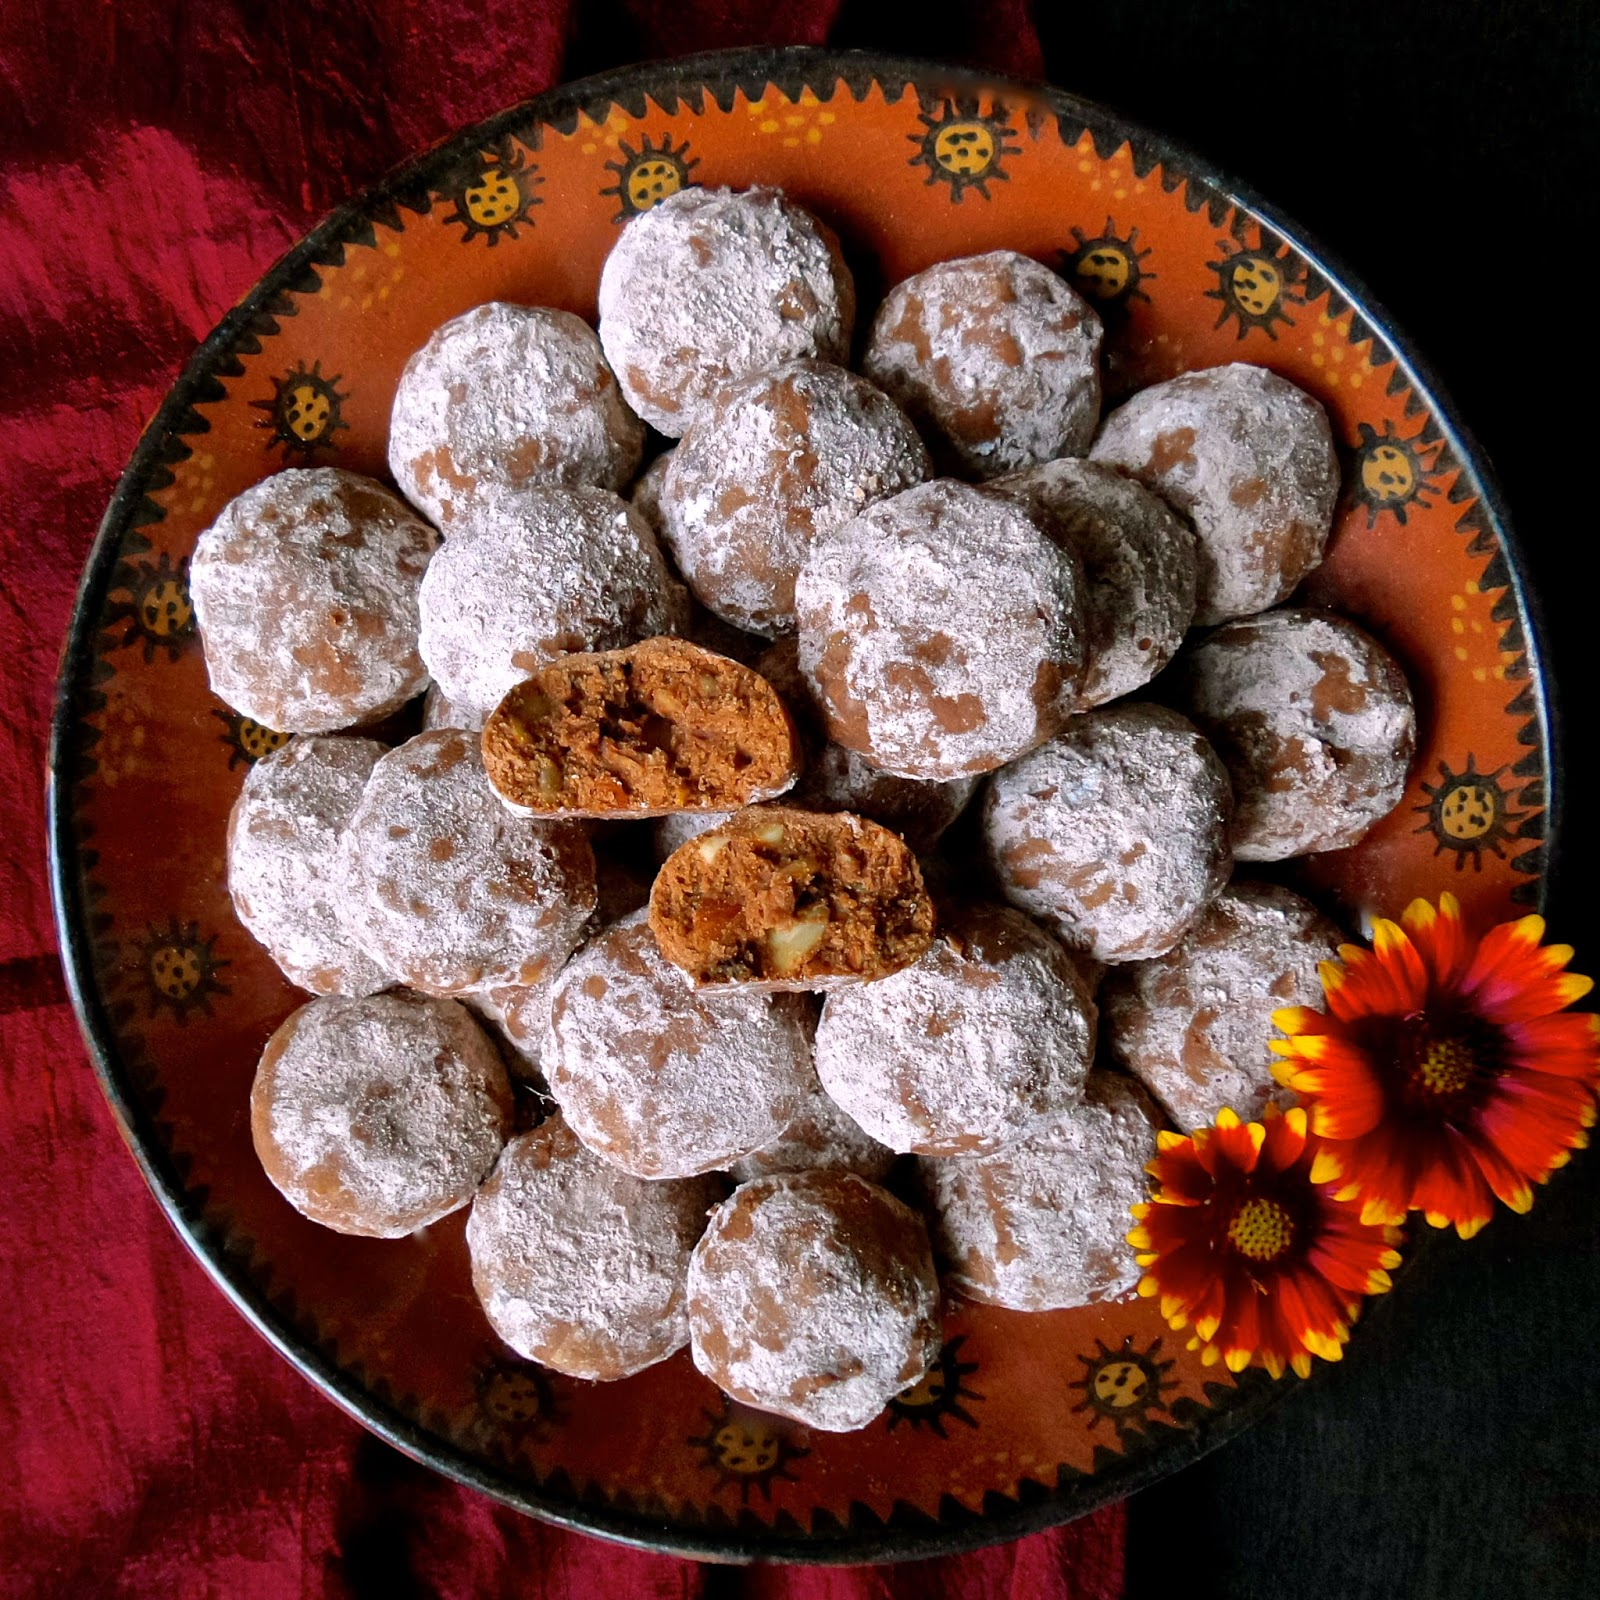 mexican chocolate snowballs, mexican, chocolate, cookies, vegan, egg free, eggless, cinnamon, chili, almonds, easy, recipe, vegetarian,